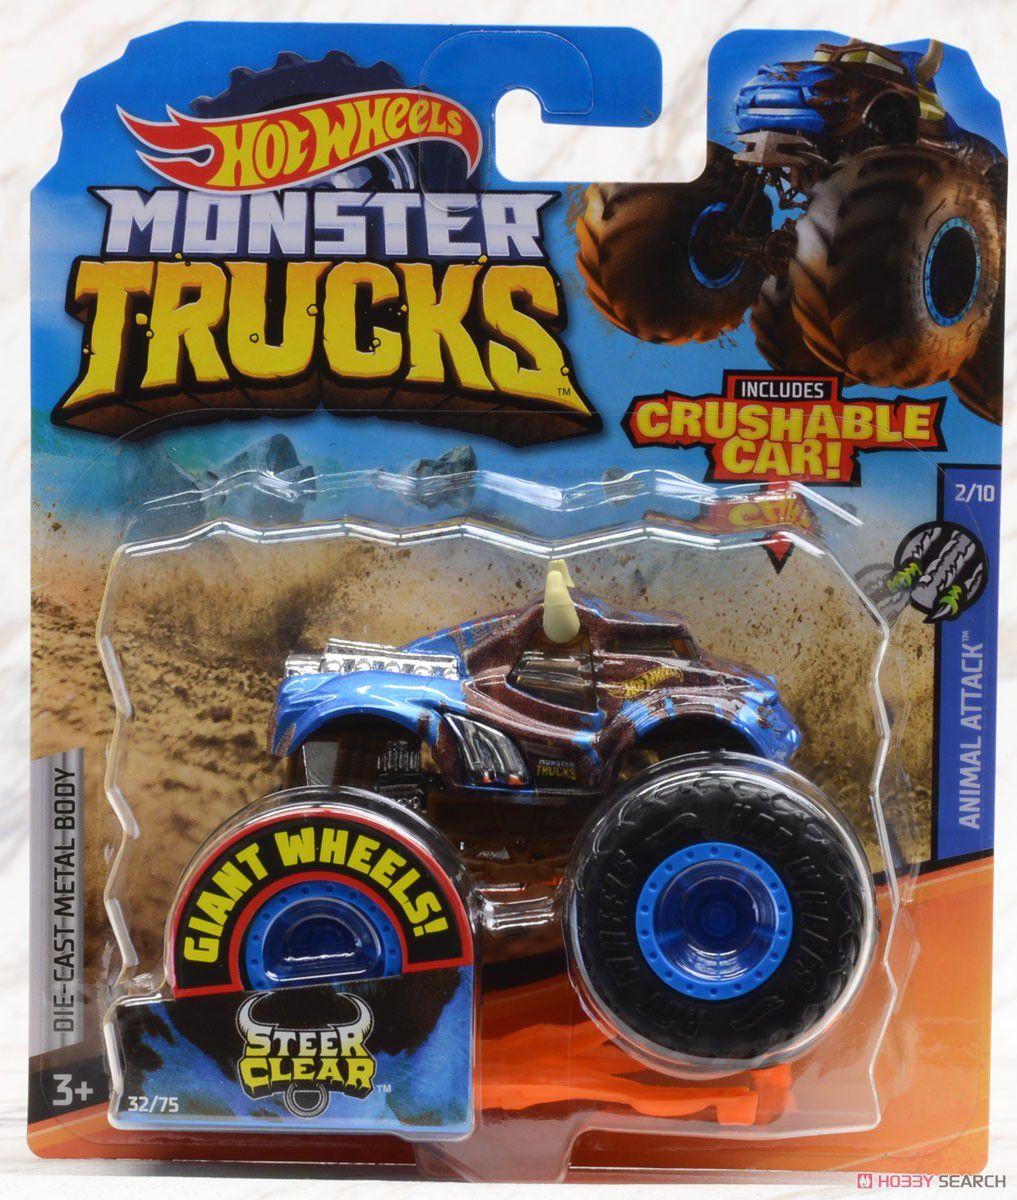 Hot Wheels Monster Trucks Die-Cast Vehicle Ref.Gjf21 Mattel